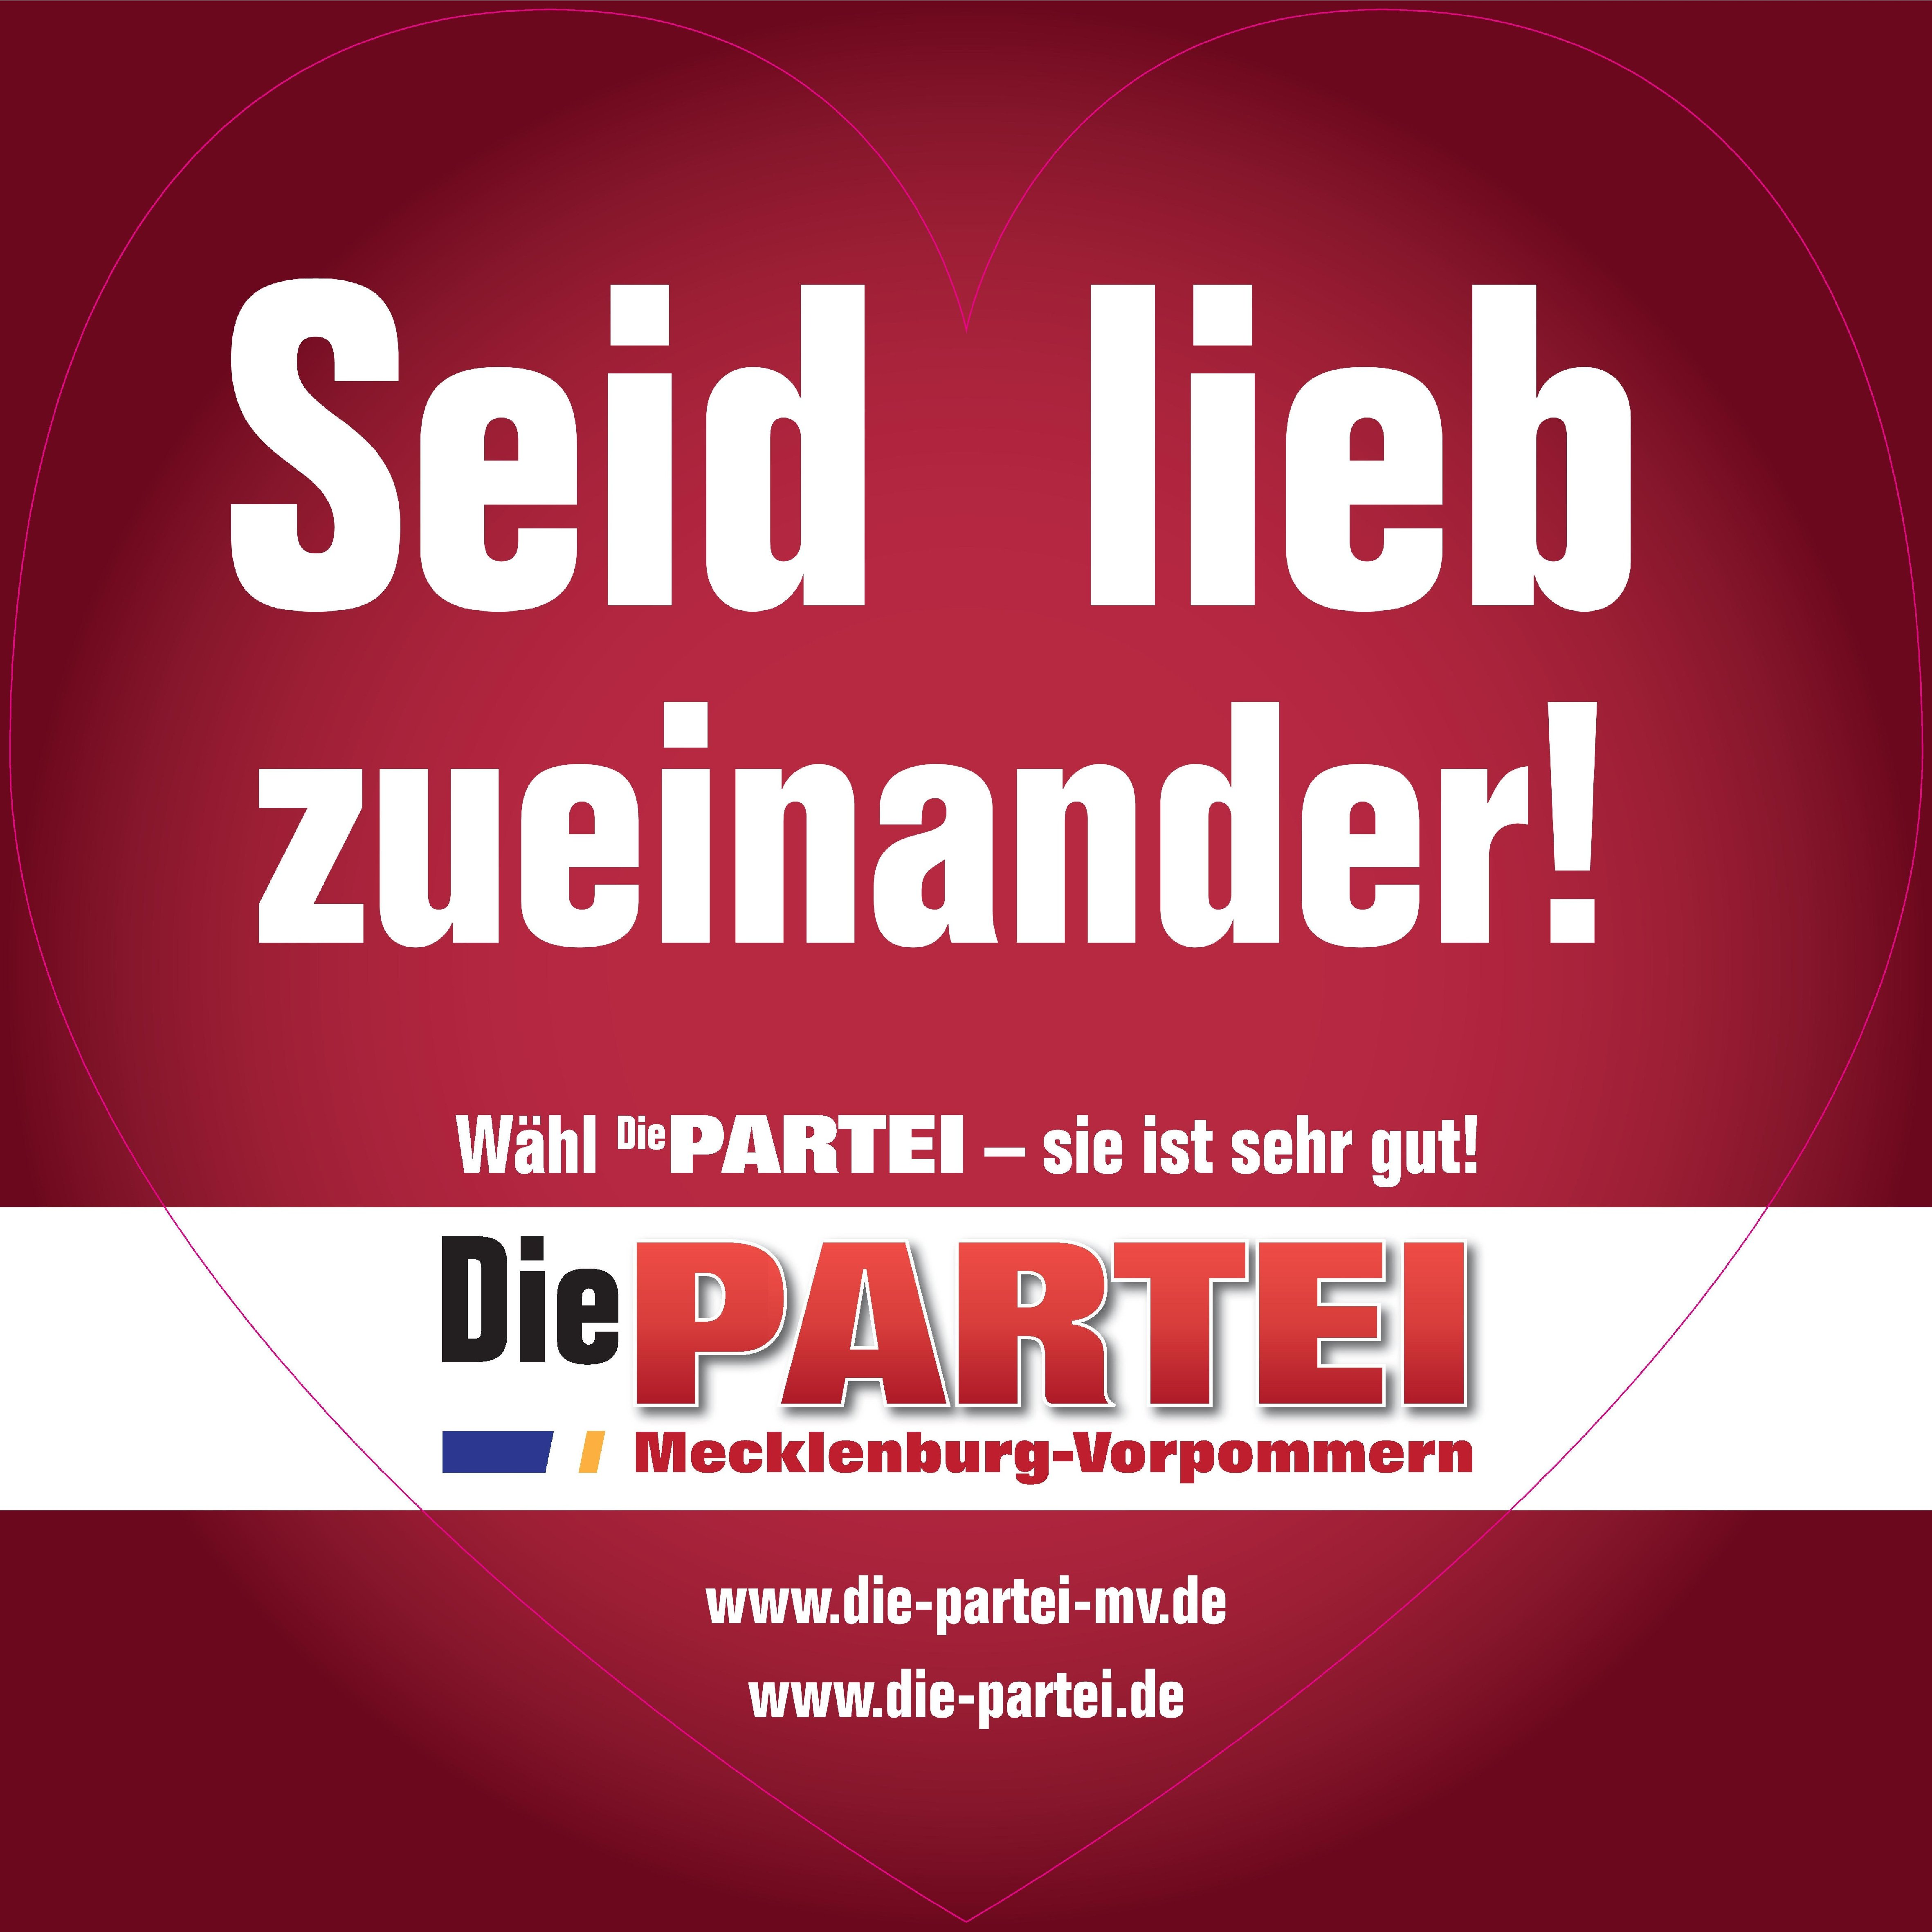 Plakat-MV-Herz_40x40